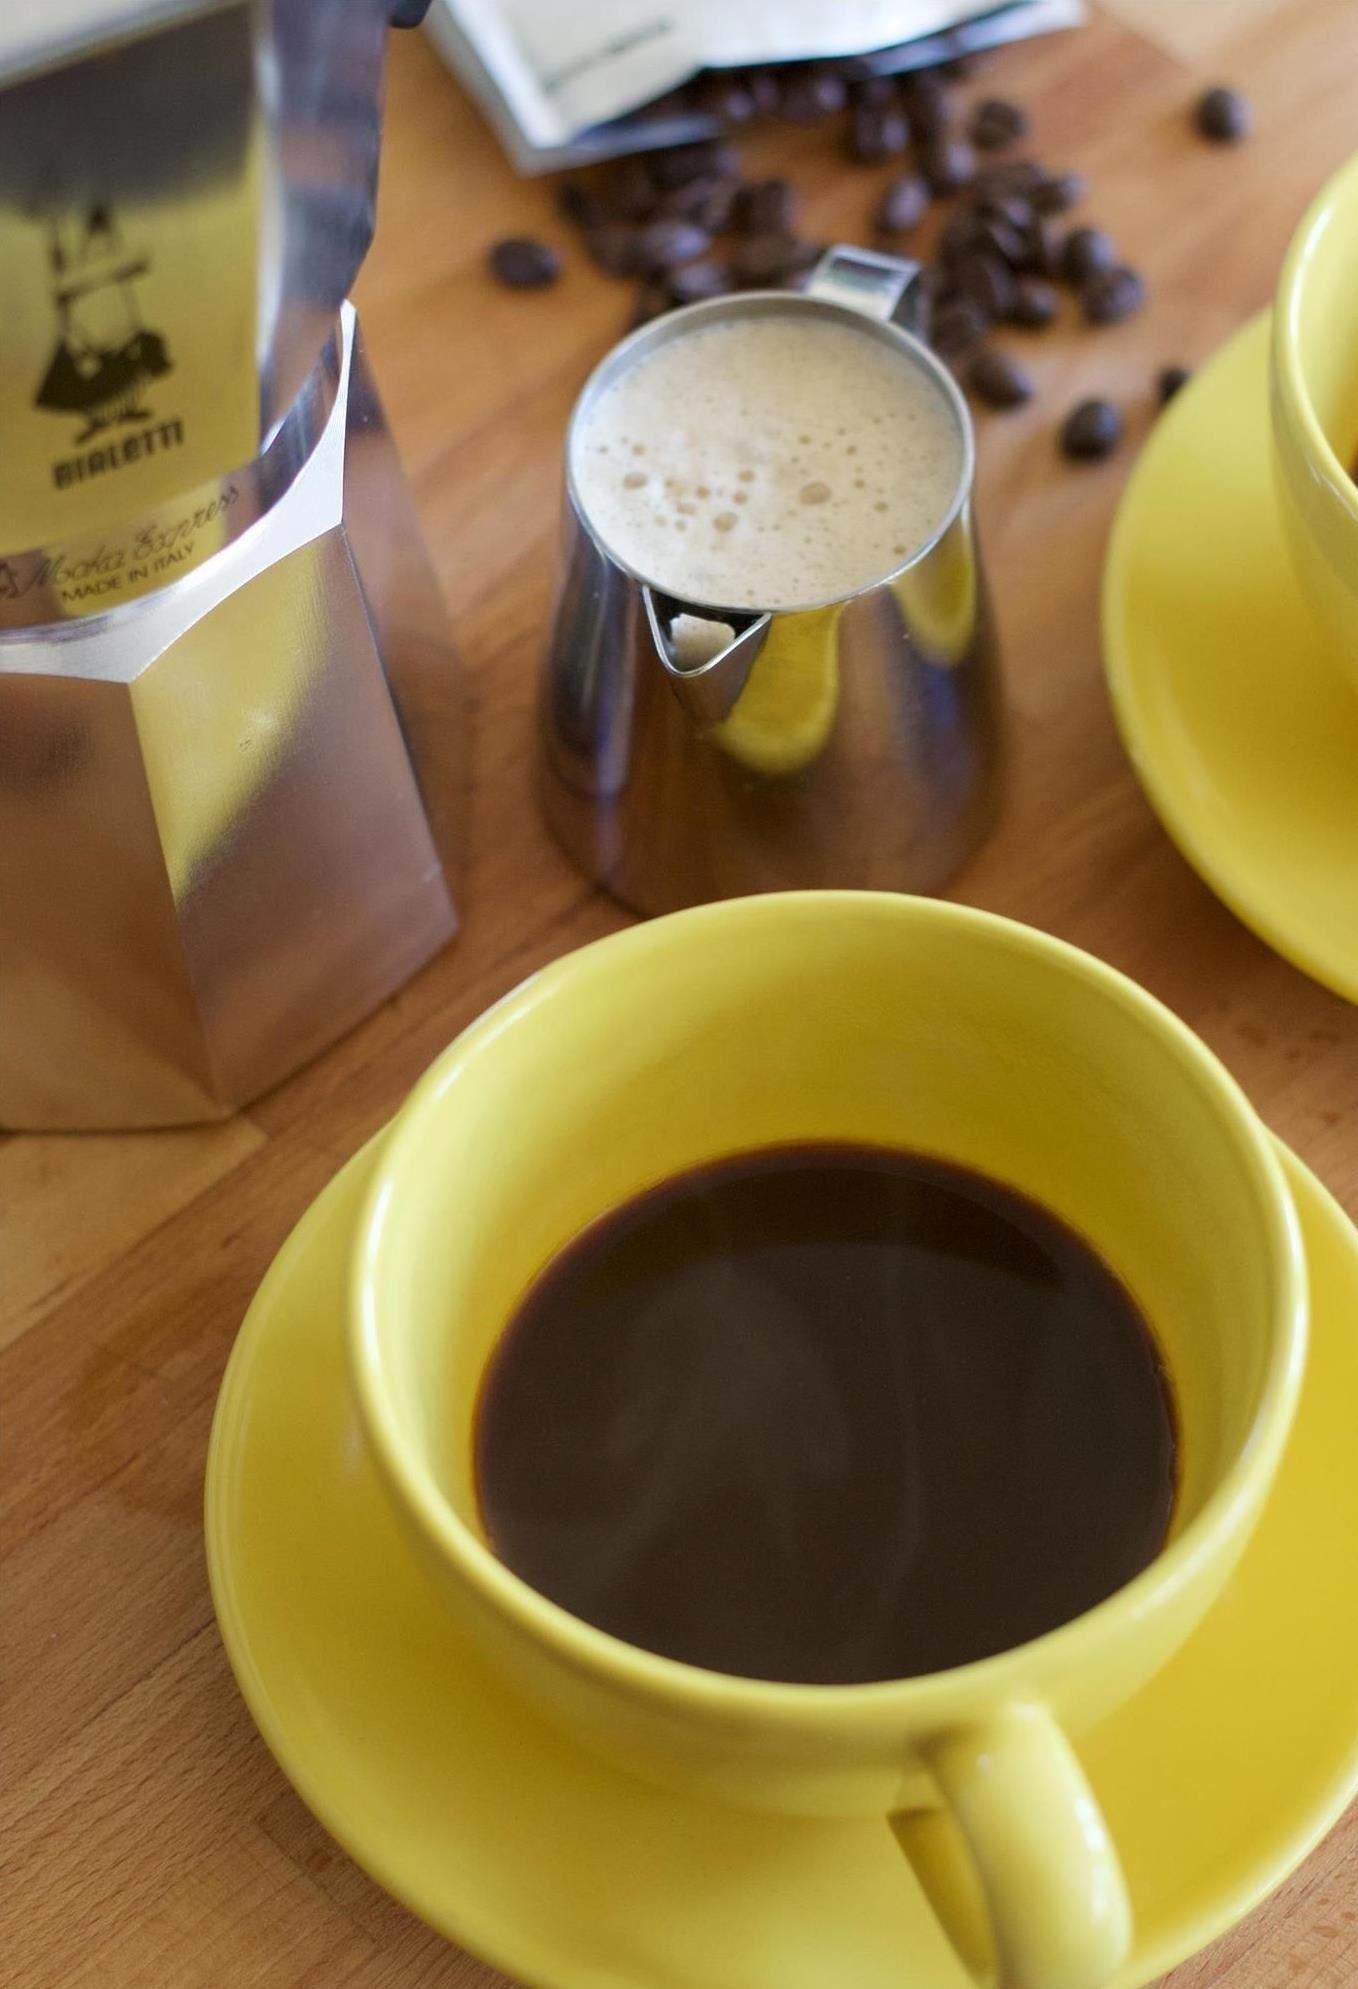 How to Clone Starbucks' Secret Dirty Chai Latte